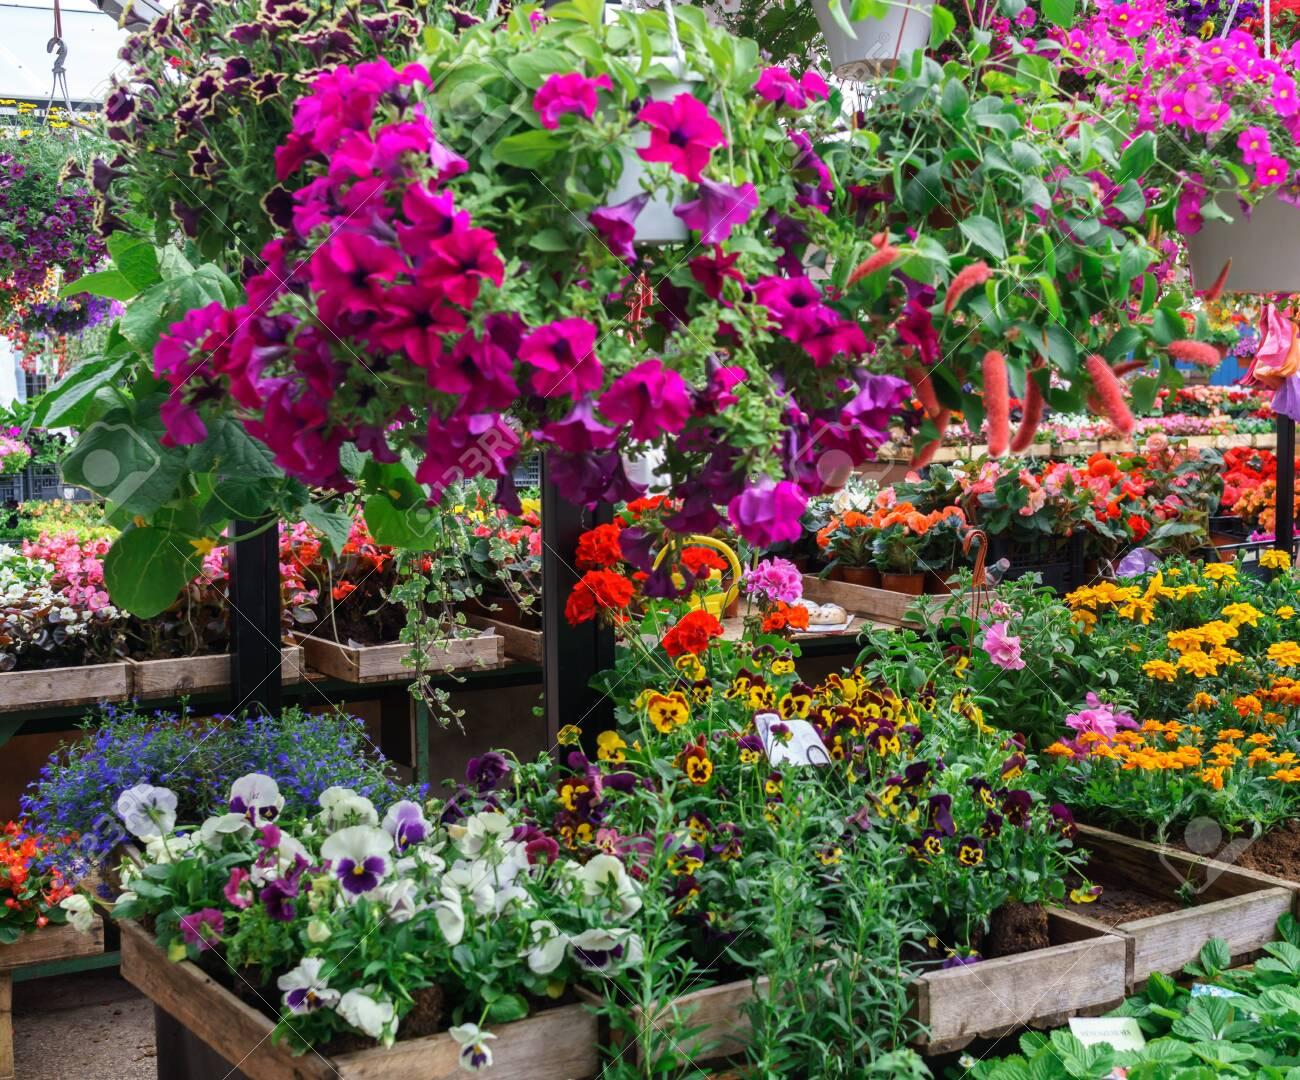 Rows of flower seedlings in the village market - 136072755